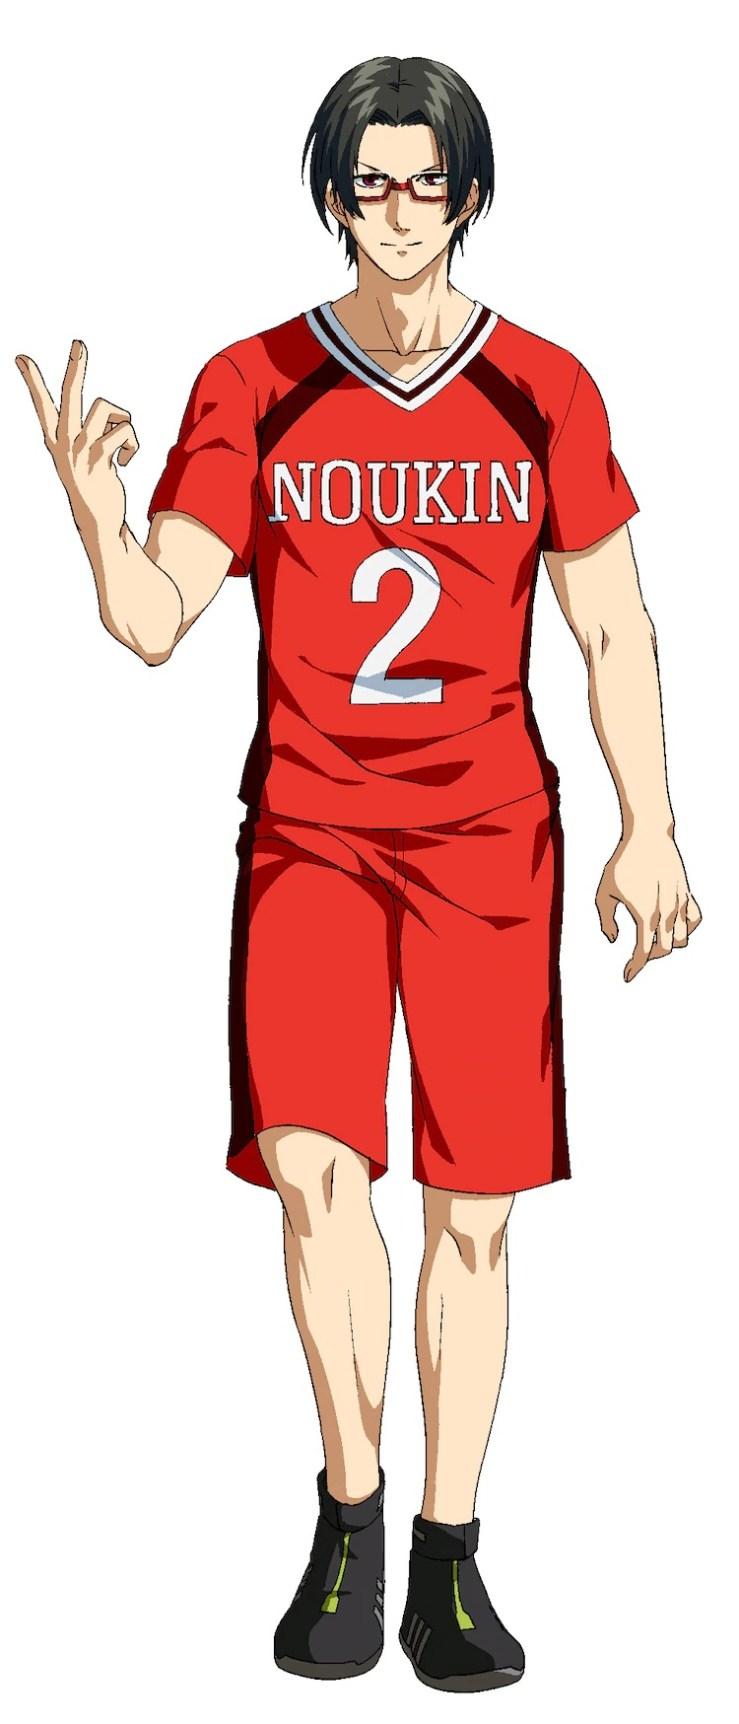 Sebuah pengaturan karakter Kei Iura, anggota berkacamata dari klub kabaddi Sekolah Menengah Noukin yang sikap lembutnya menyembunyikan kelicikan yang kejam, dari anime TV Kabaddi yang akan datang.